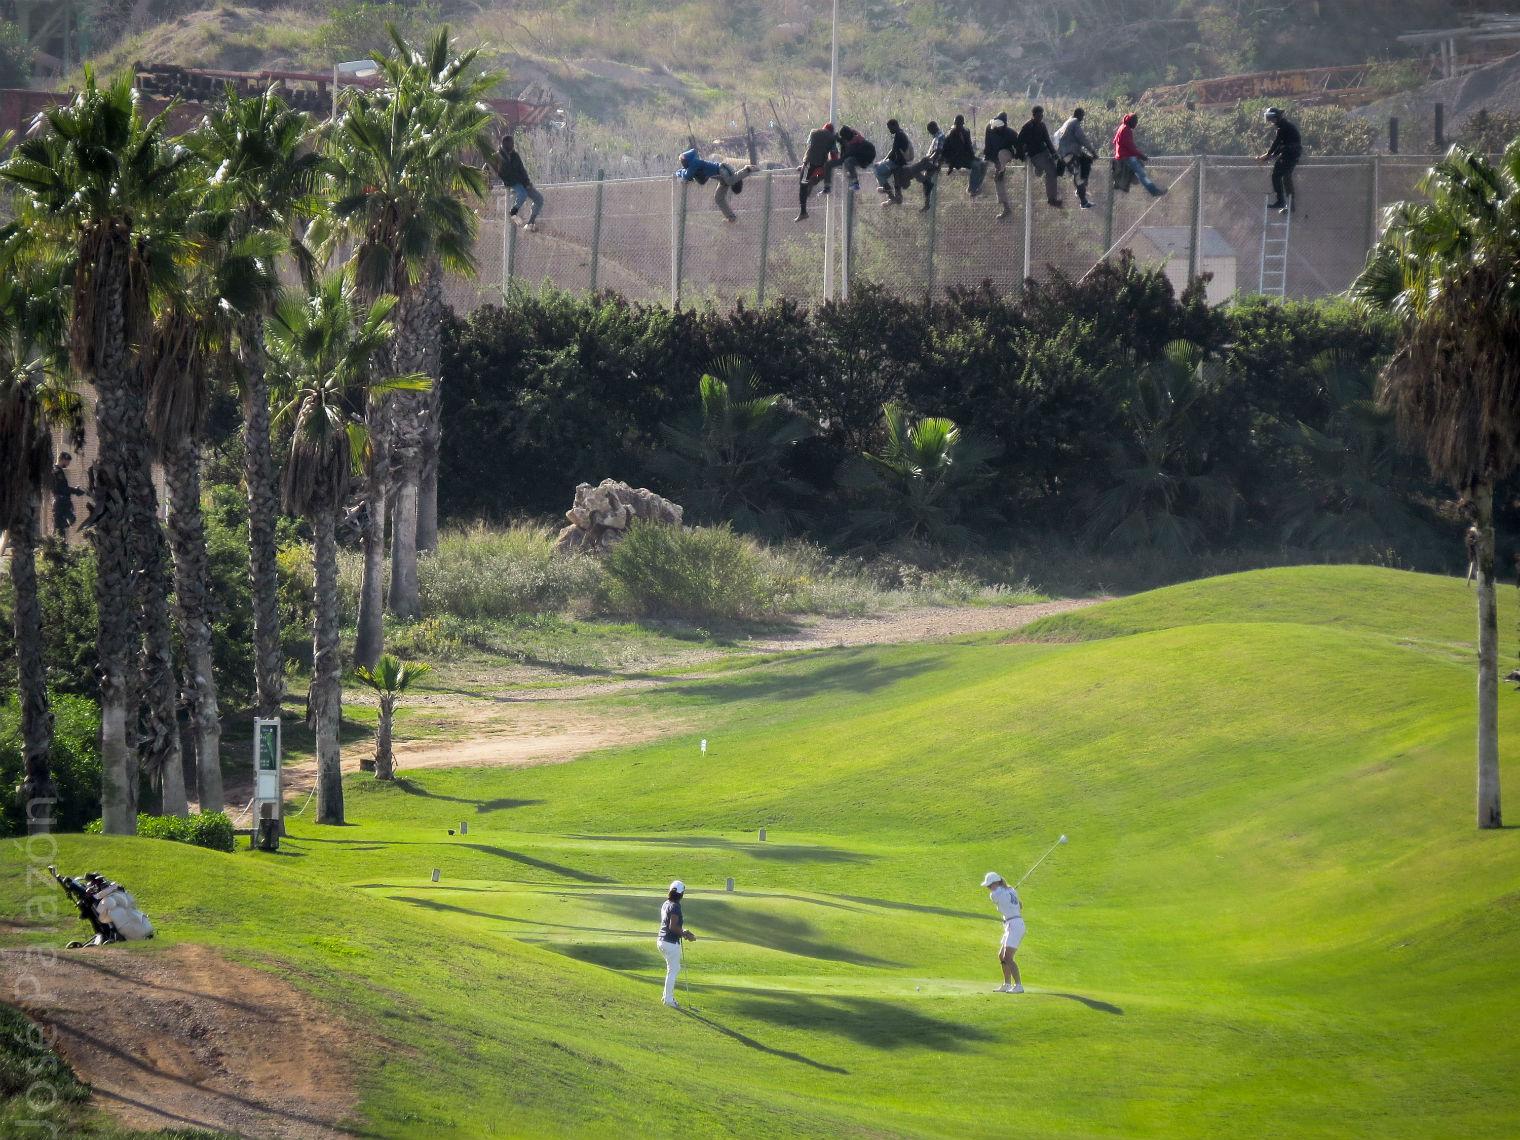 melilla-clandestin-golfeuse-photo